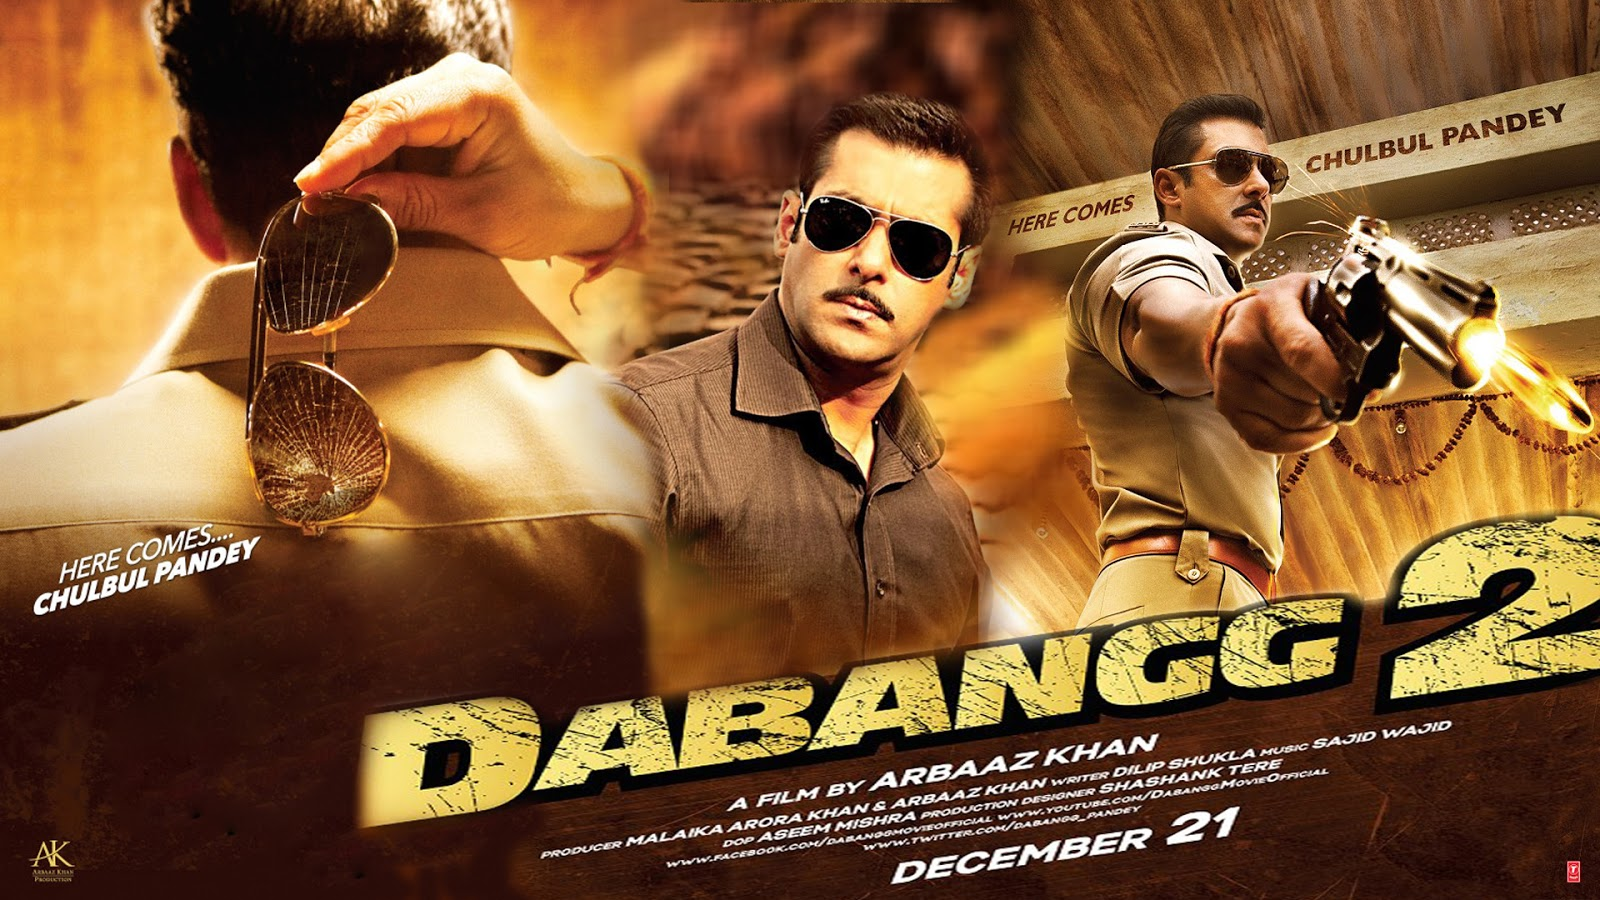 download island dabangg 2 full hd movie download